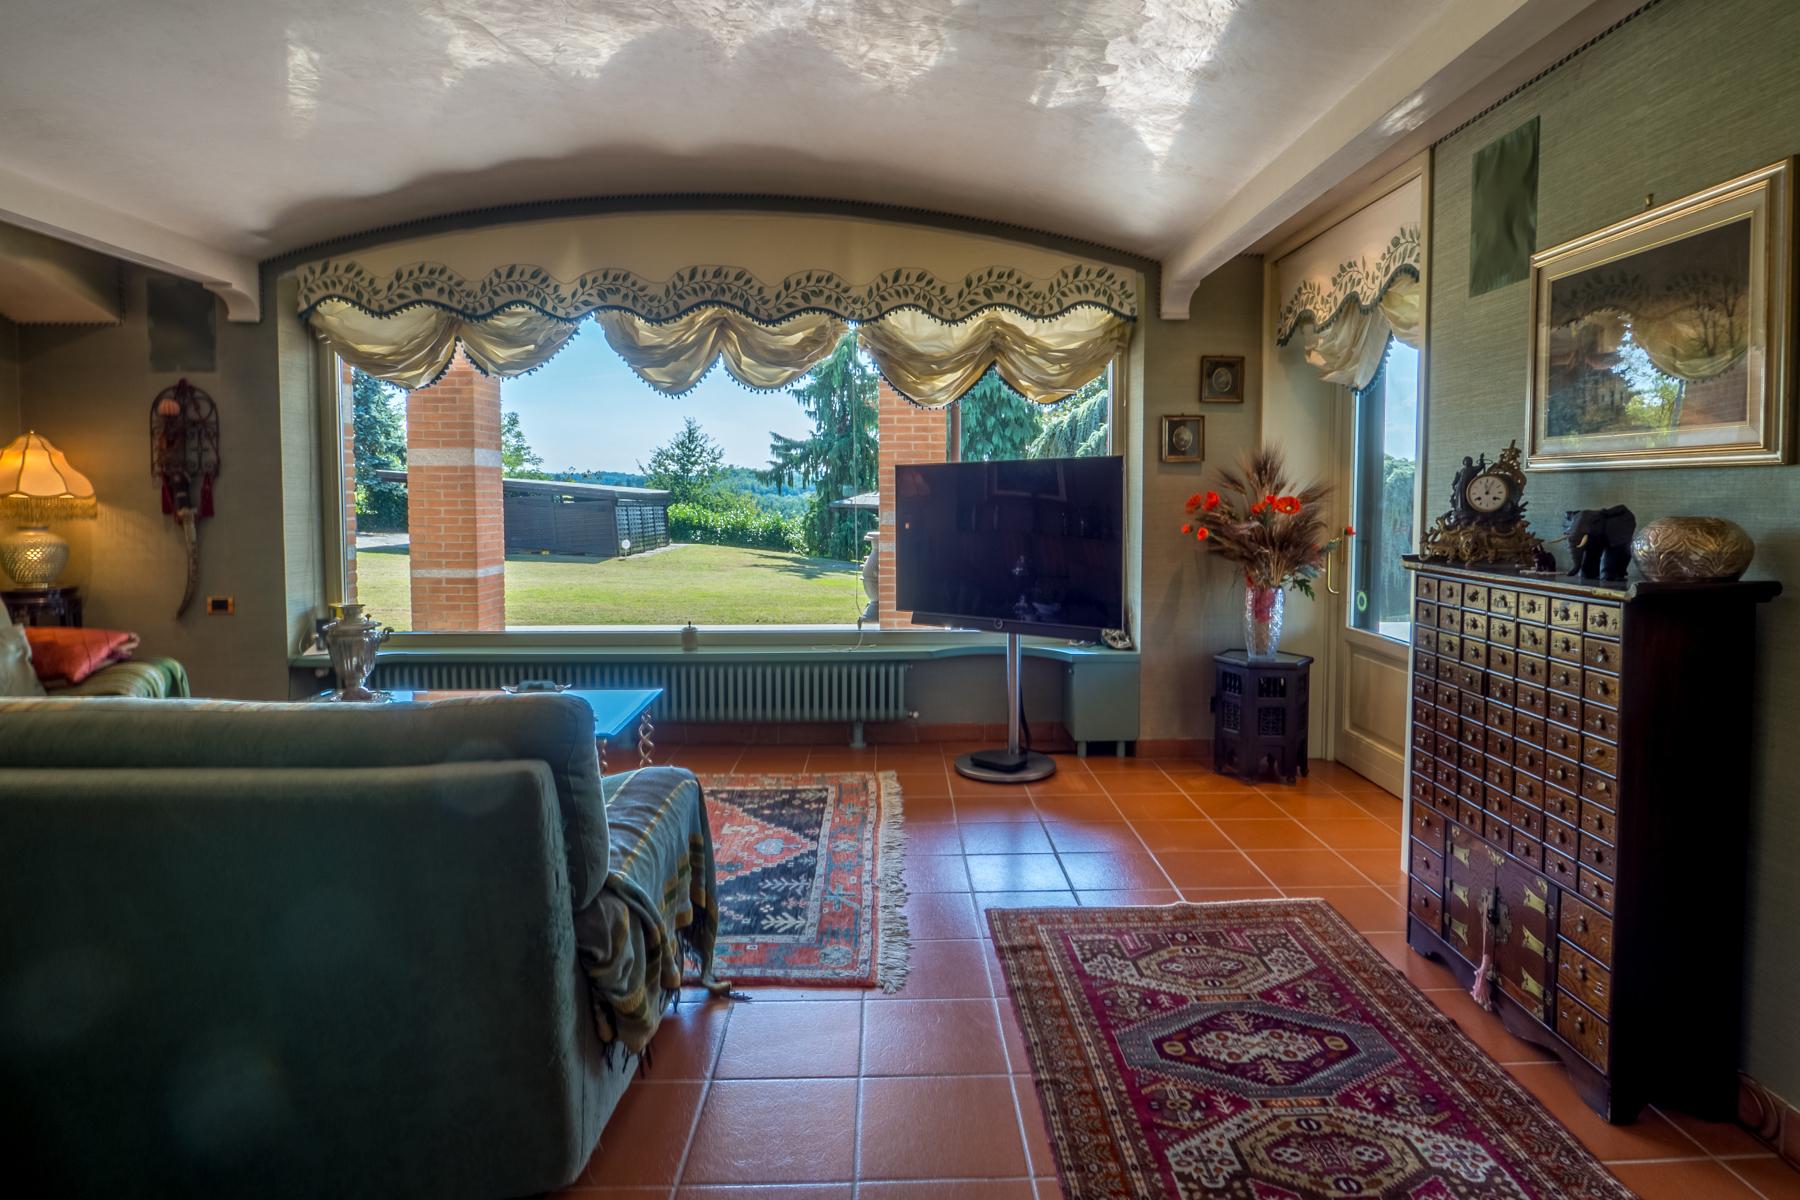 Villa in Vendita a Cantarana: 5 locali, 700 mq - Foto 13